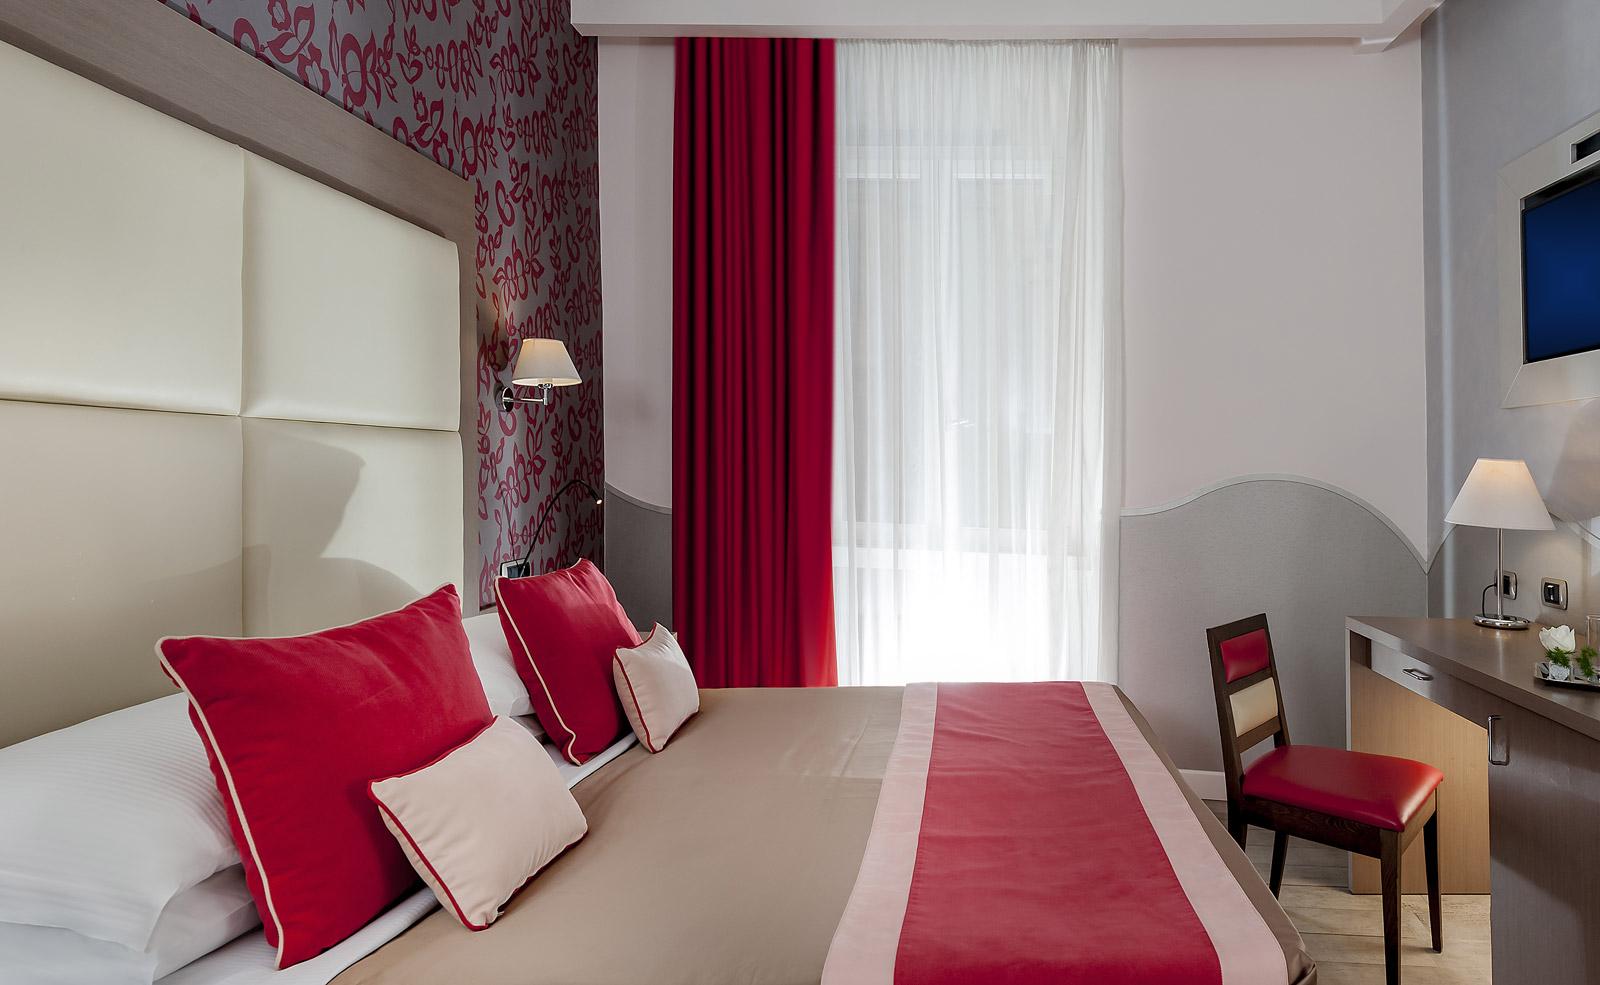 Camera Matrimoniale A Roma.Camera Matrimoniale Hotel Roma Camera Matrimoniale Roma Camera